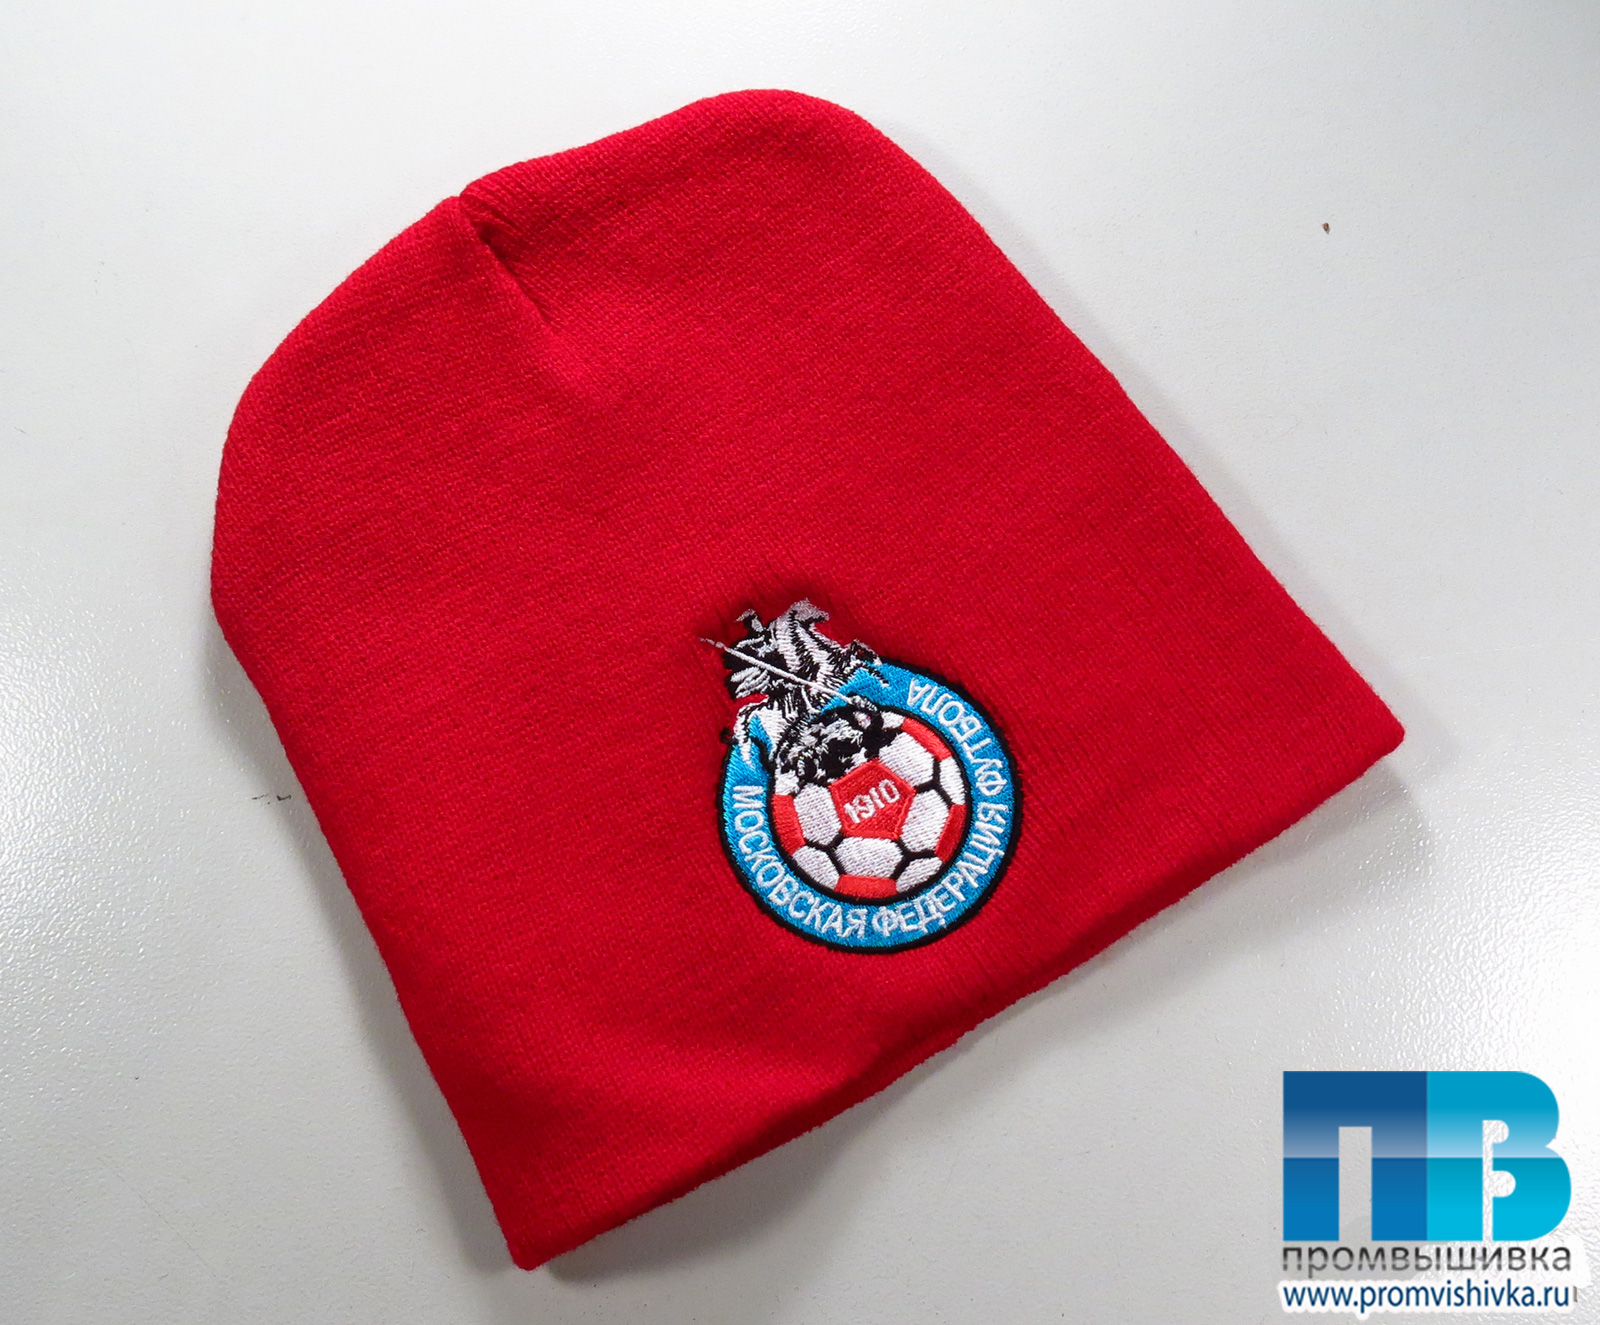 73a95b67faa0 Вышивка на шапках символики для Московской федерации футбола